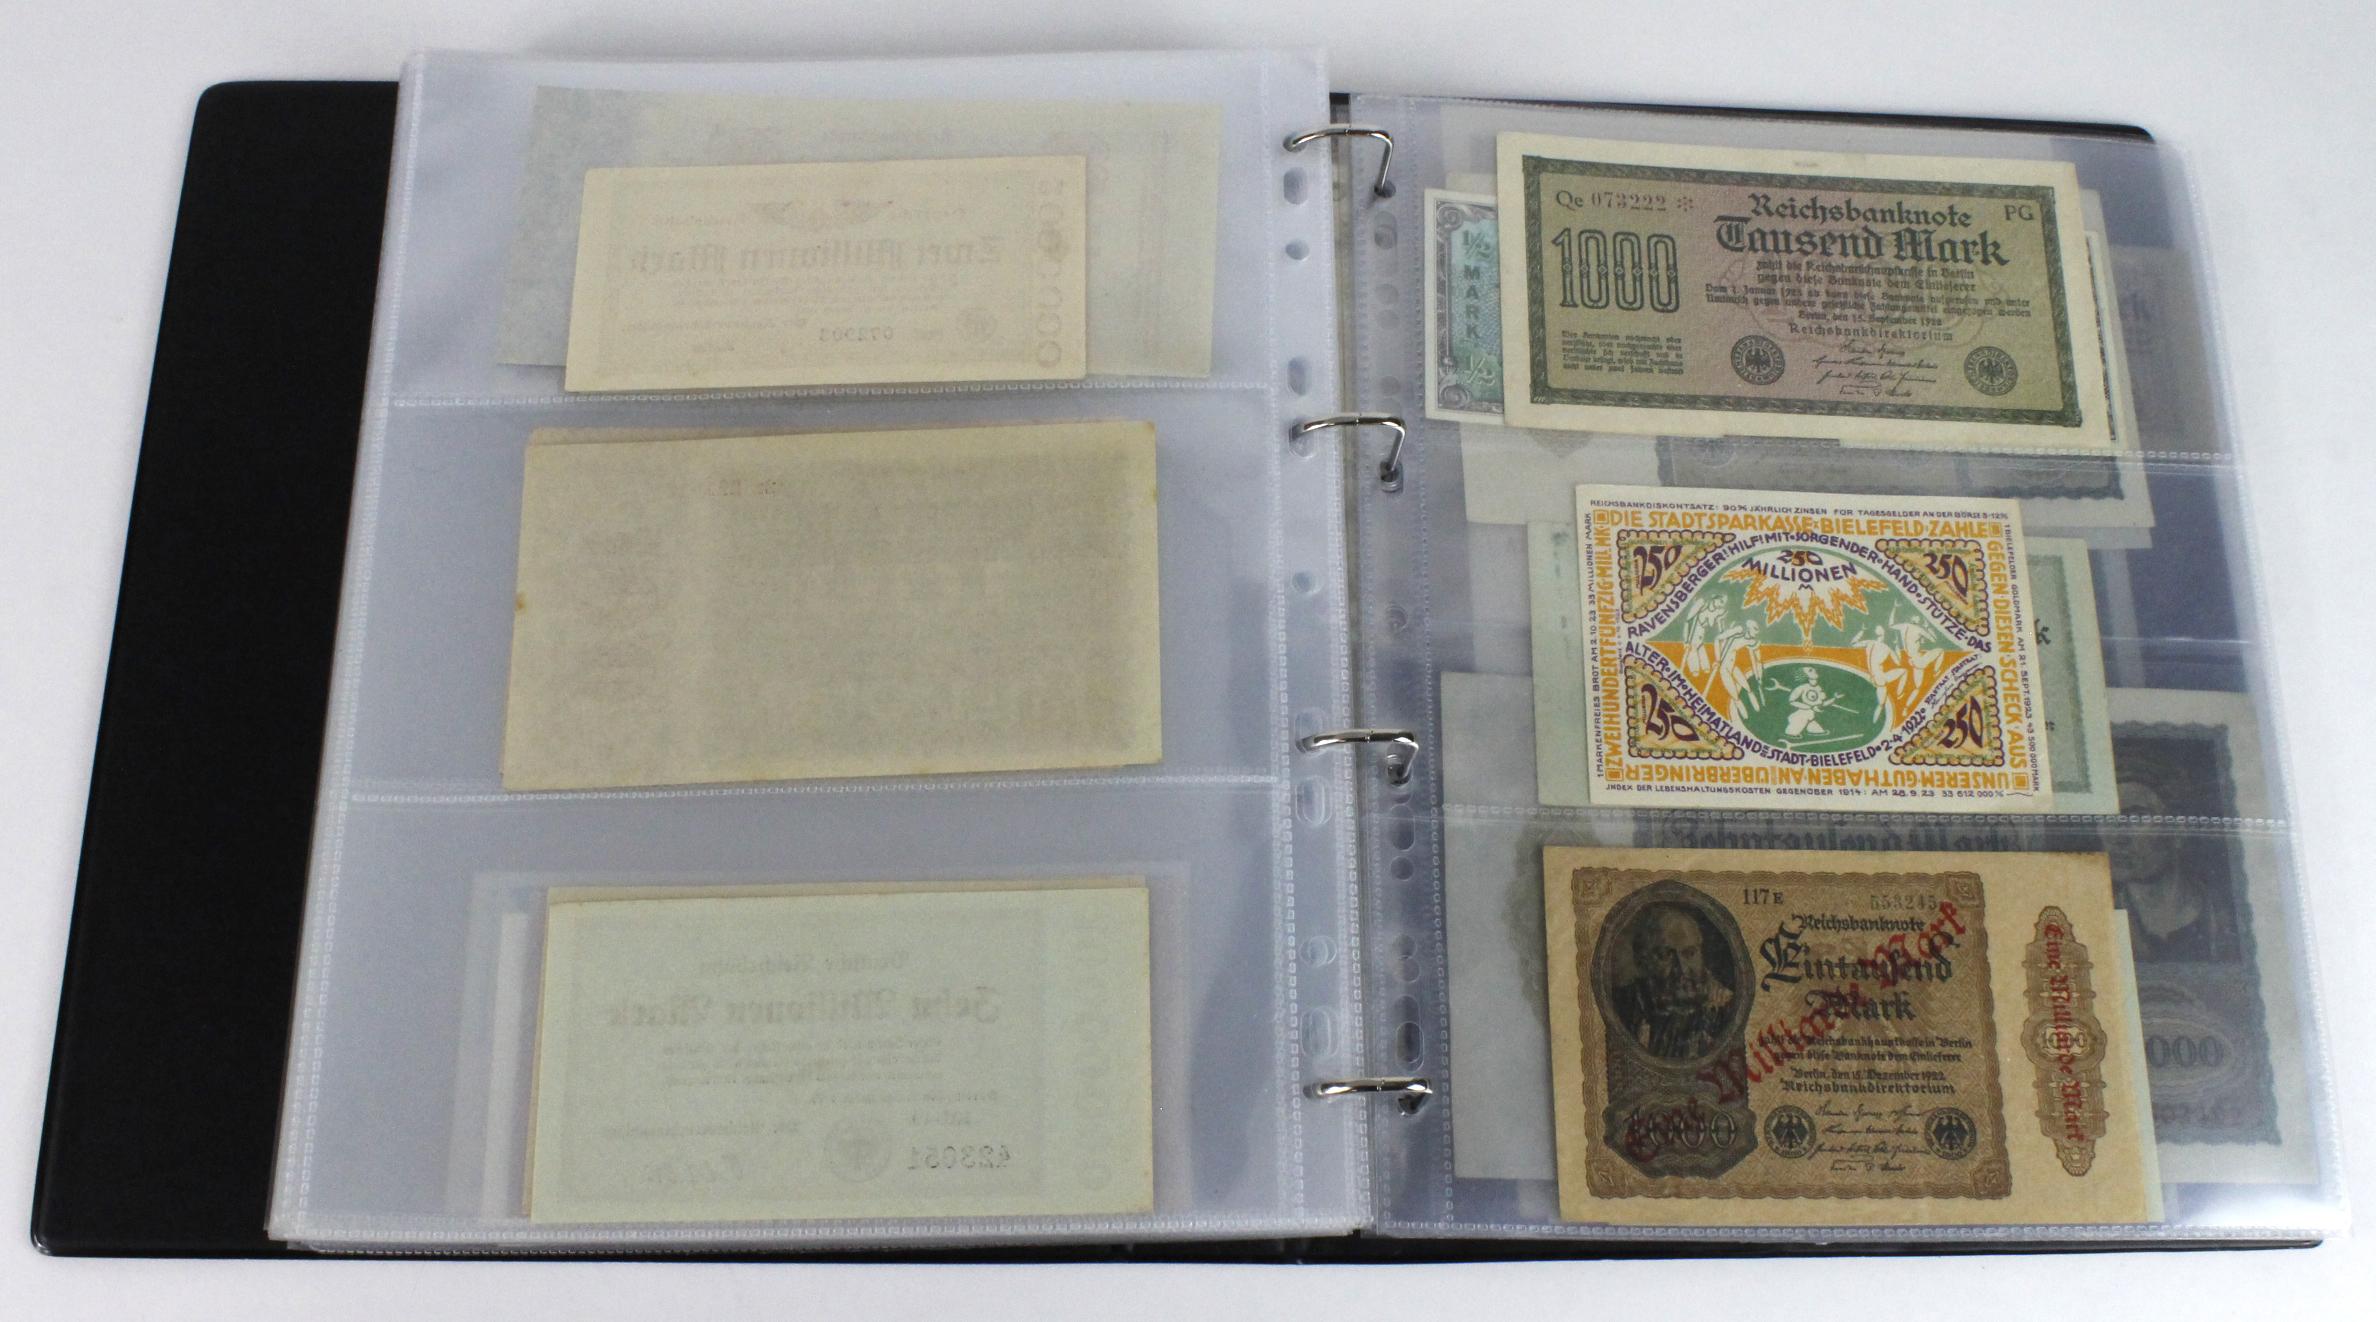 World (163), in banknote album including Bahamas, Spain, Sweden, Netherlands, Algeria, Macau, - Image 51 of 57